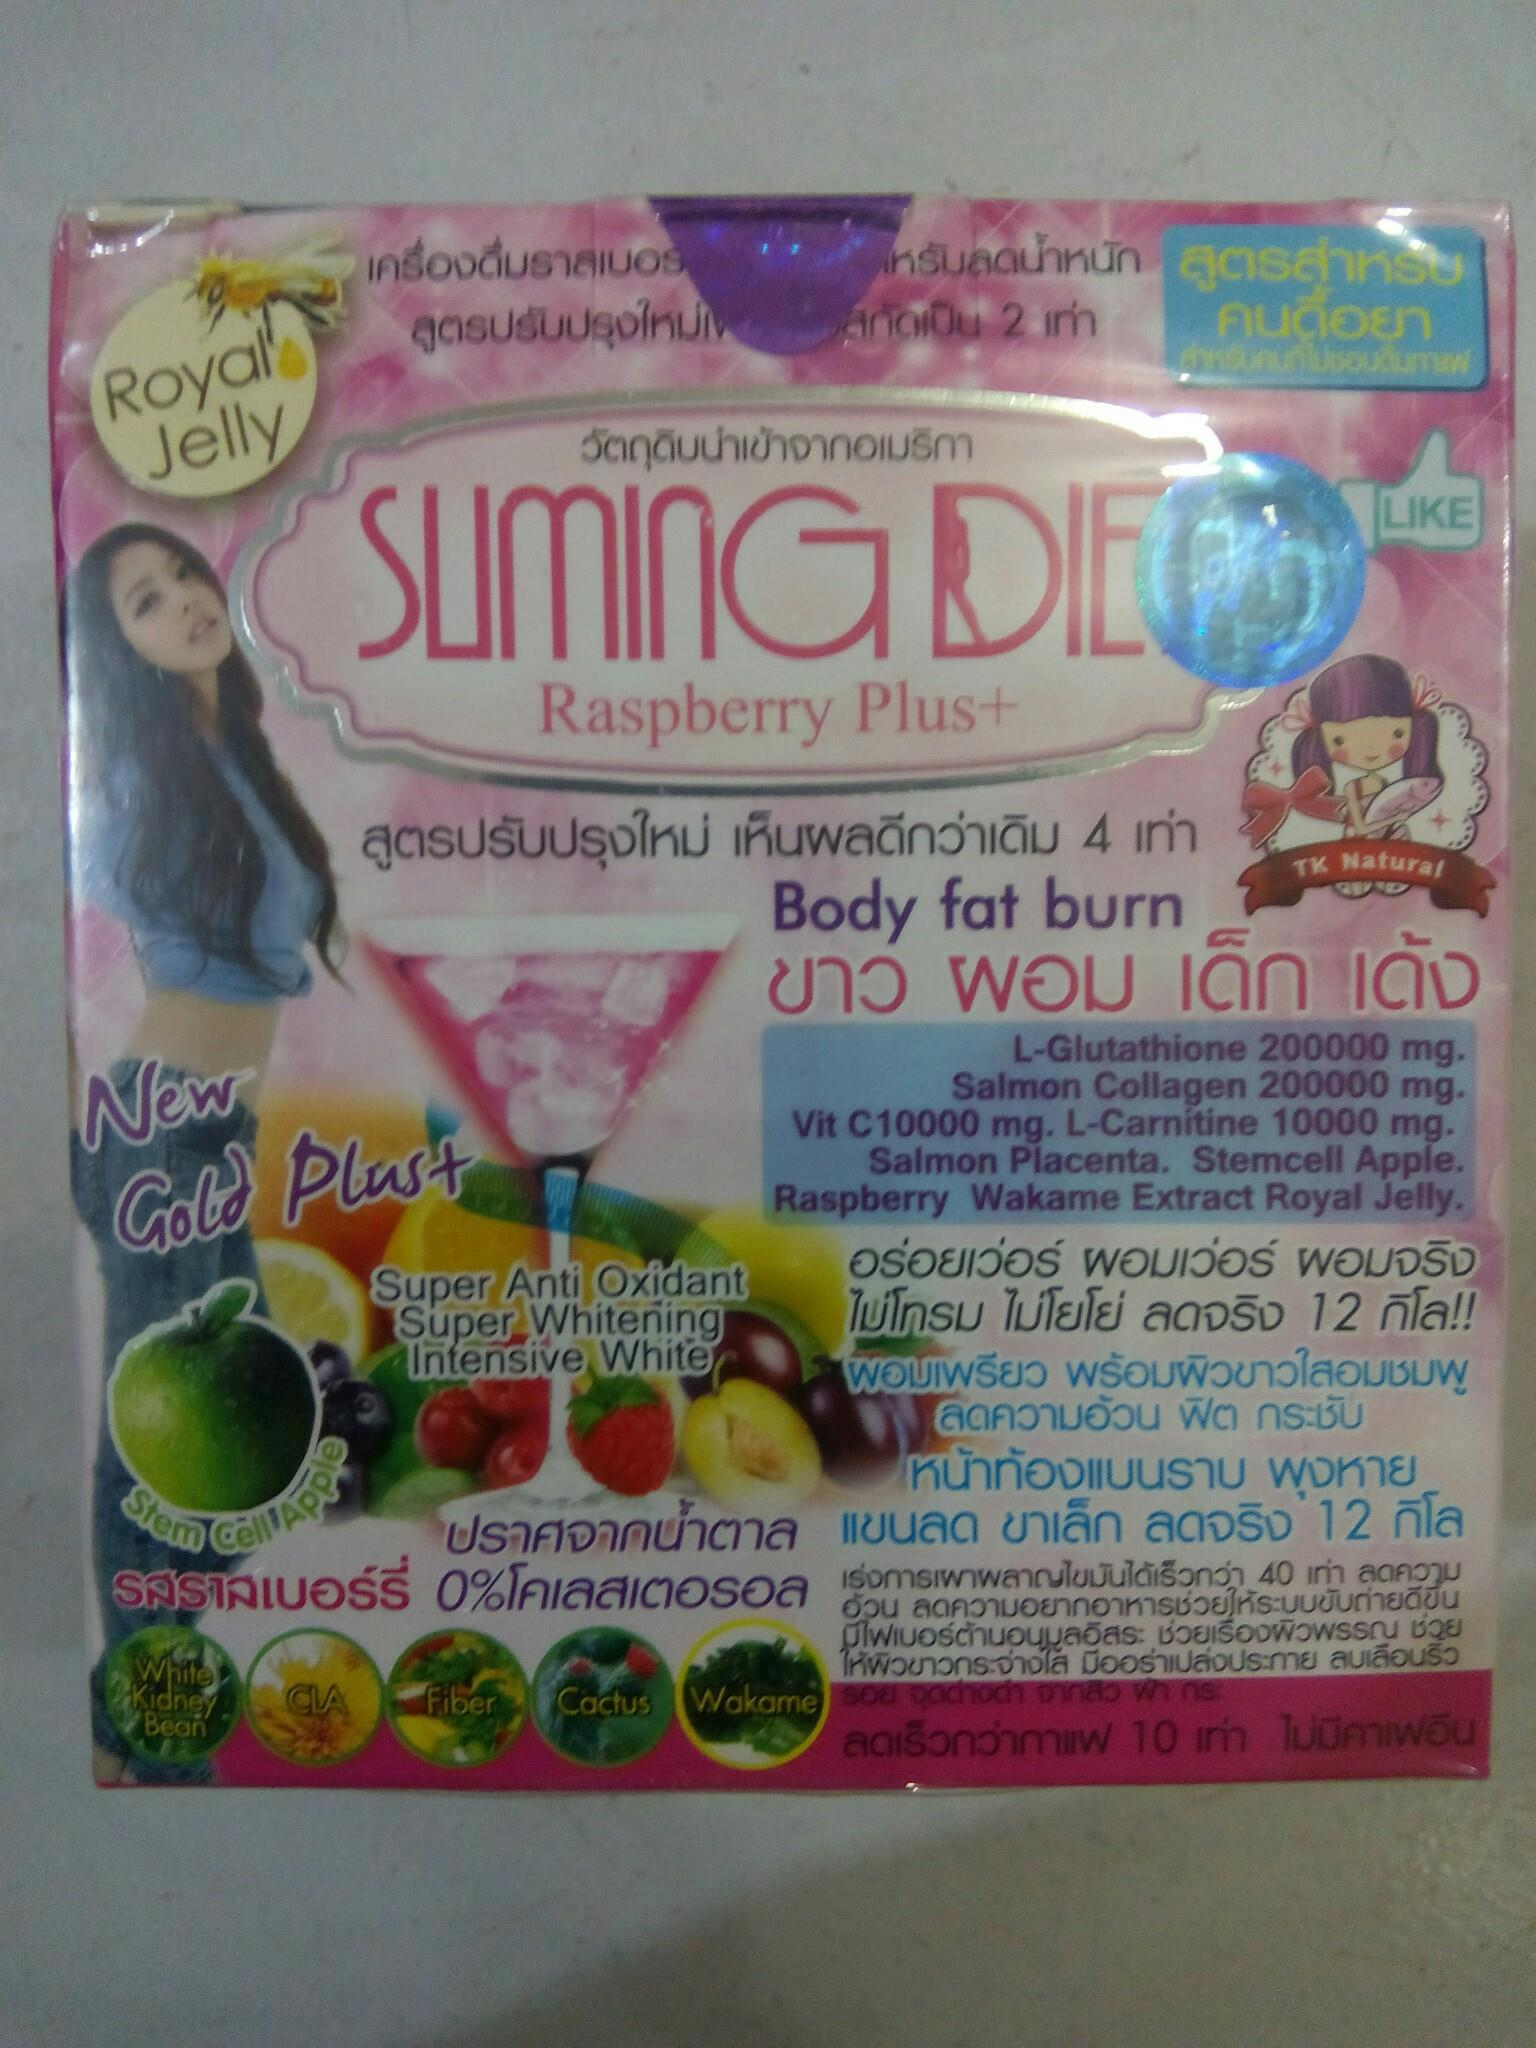 Slimming Diet Raspberry Plus Thailand images